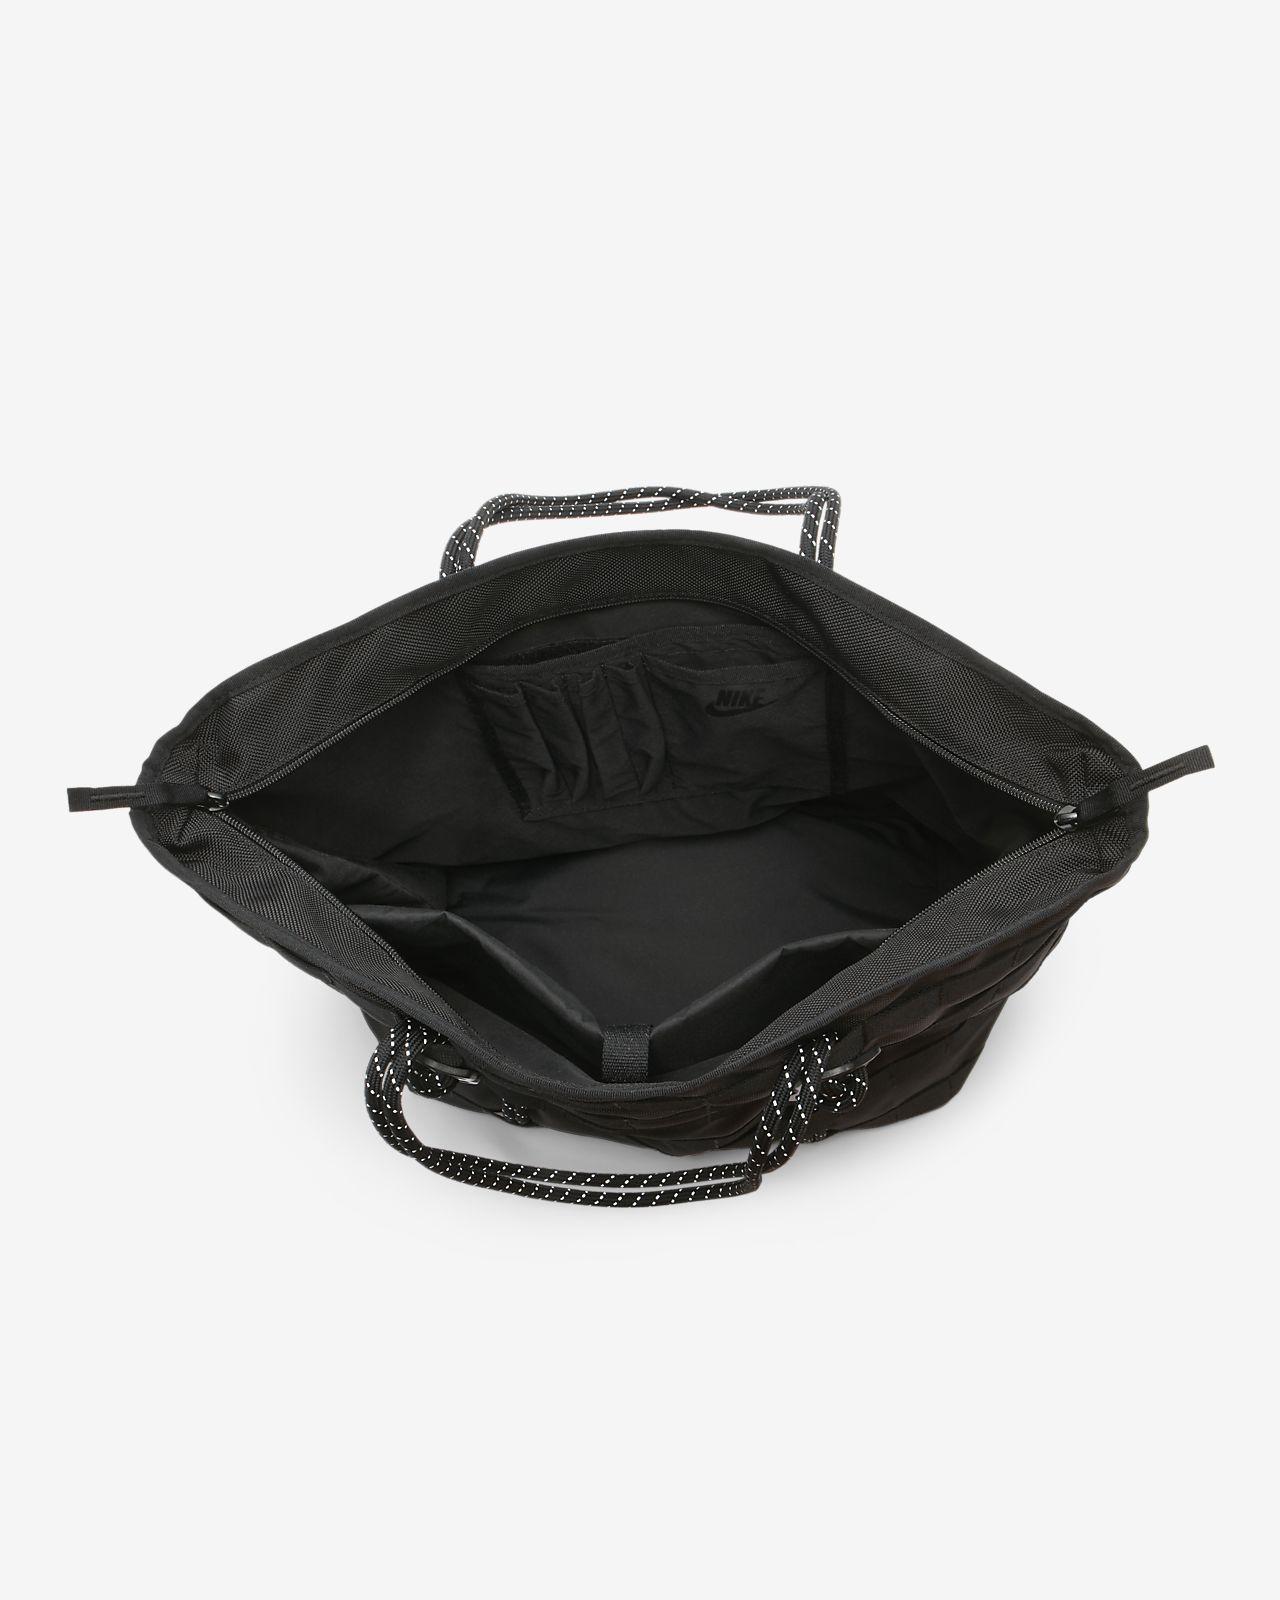 d8fdffbb25419 Nike Sportswear AF1 Tote Bag. Nike.com GB